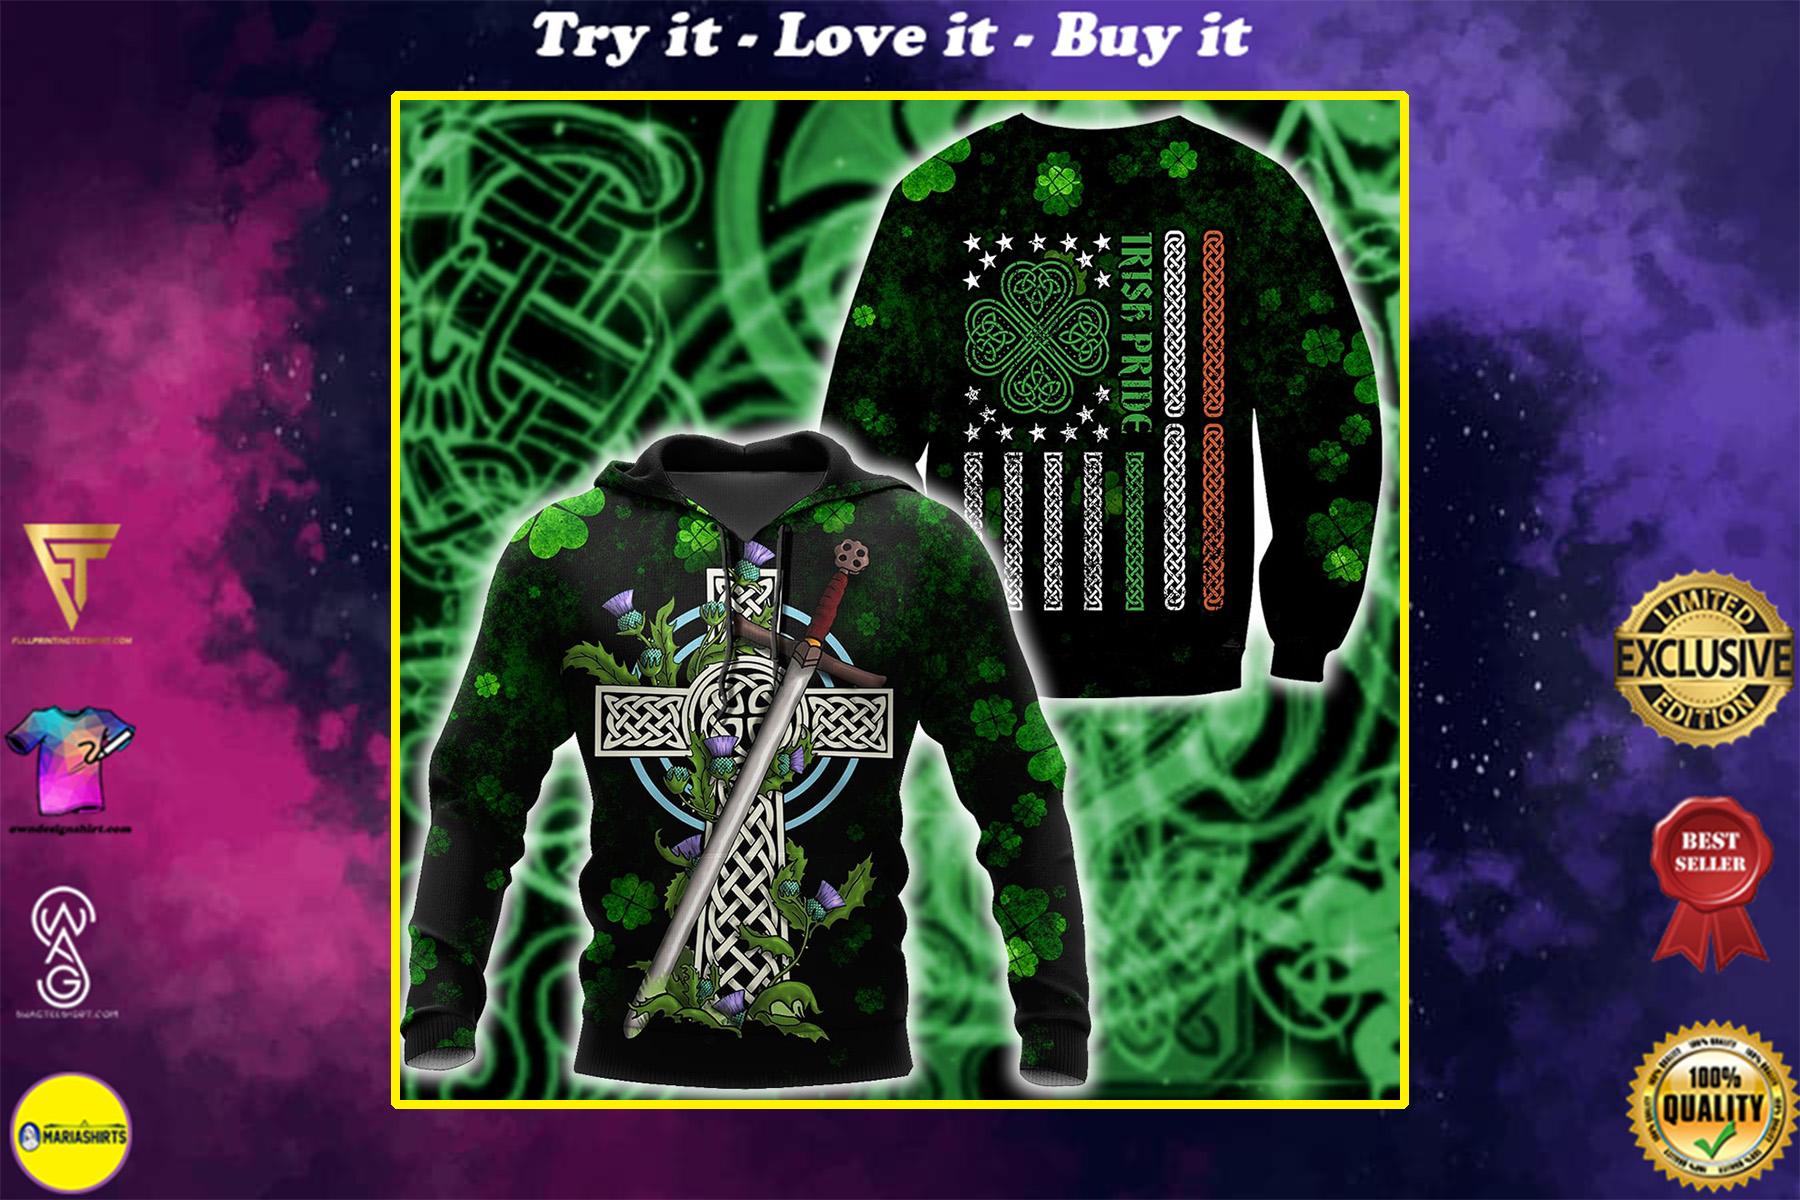 saint patricks day irish pride and sword full printing shirt